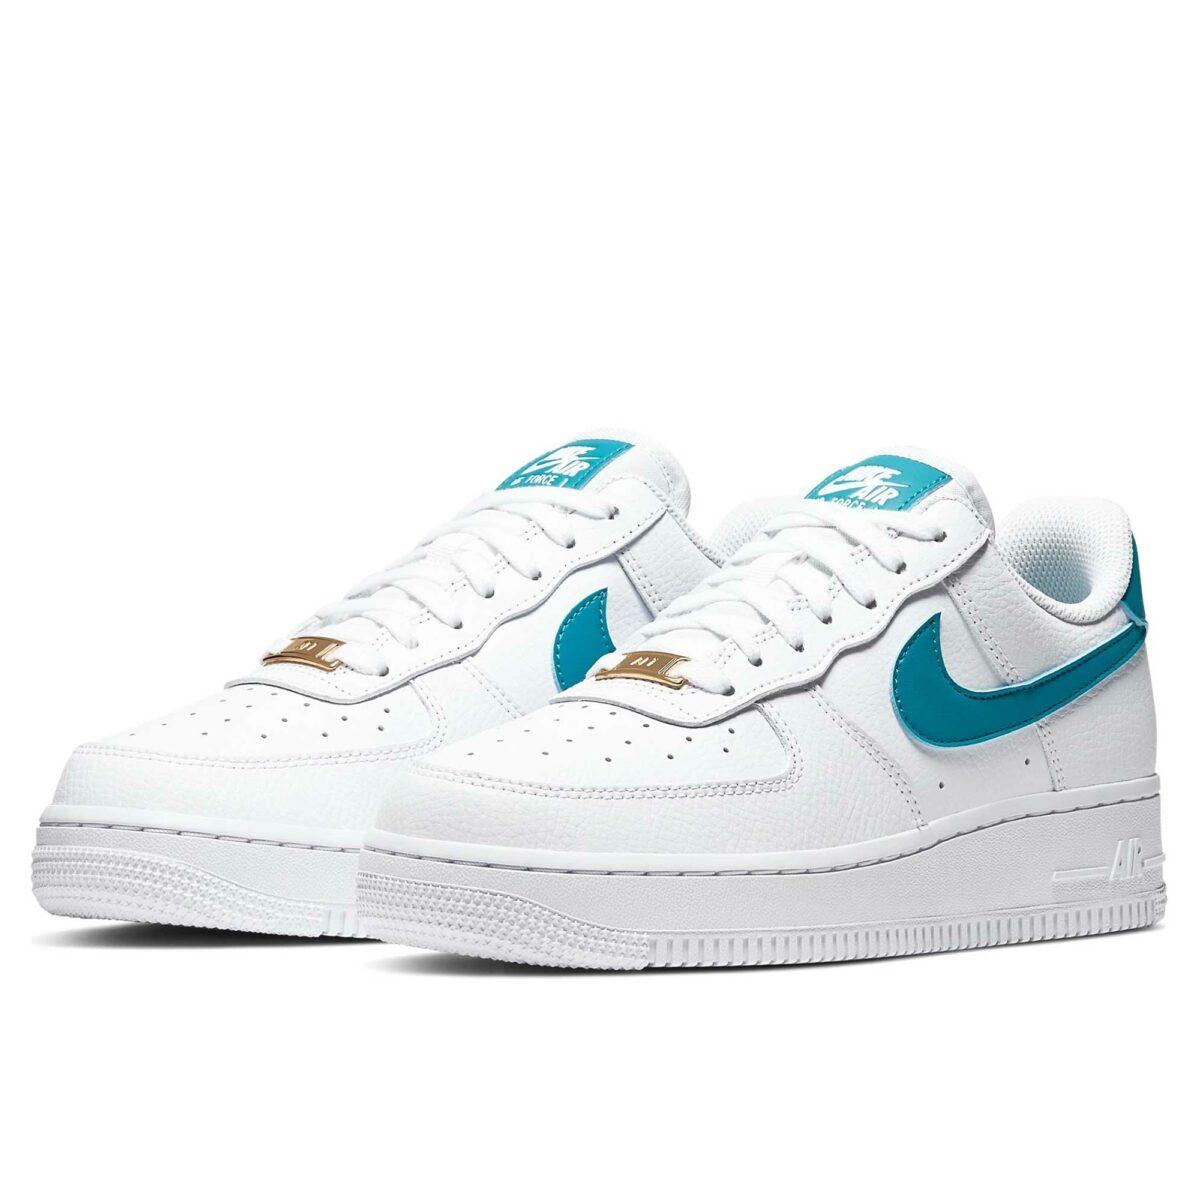 nike air force 1 white blue ah0287_109 купить